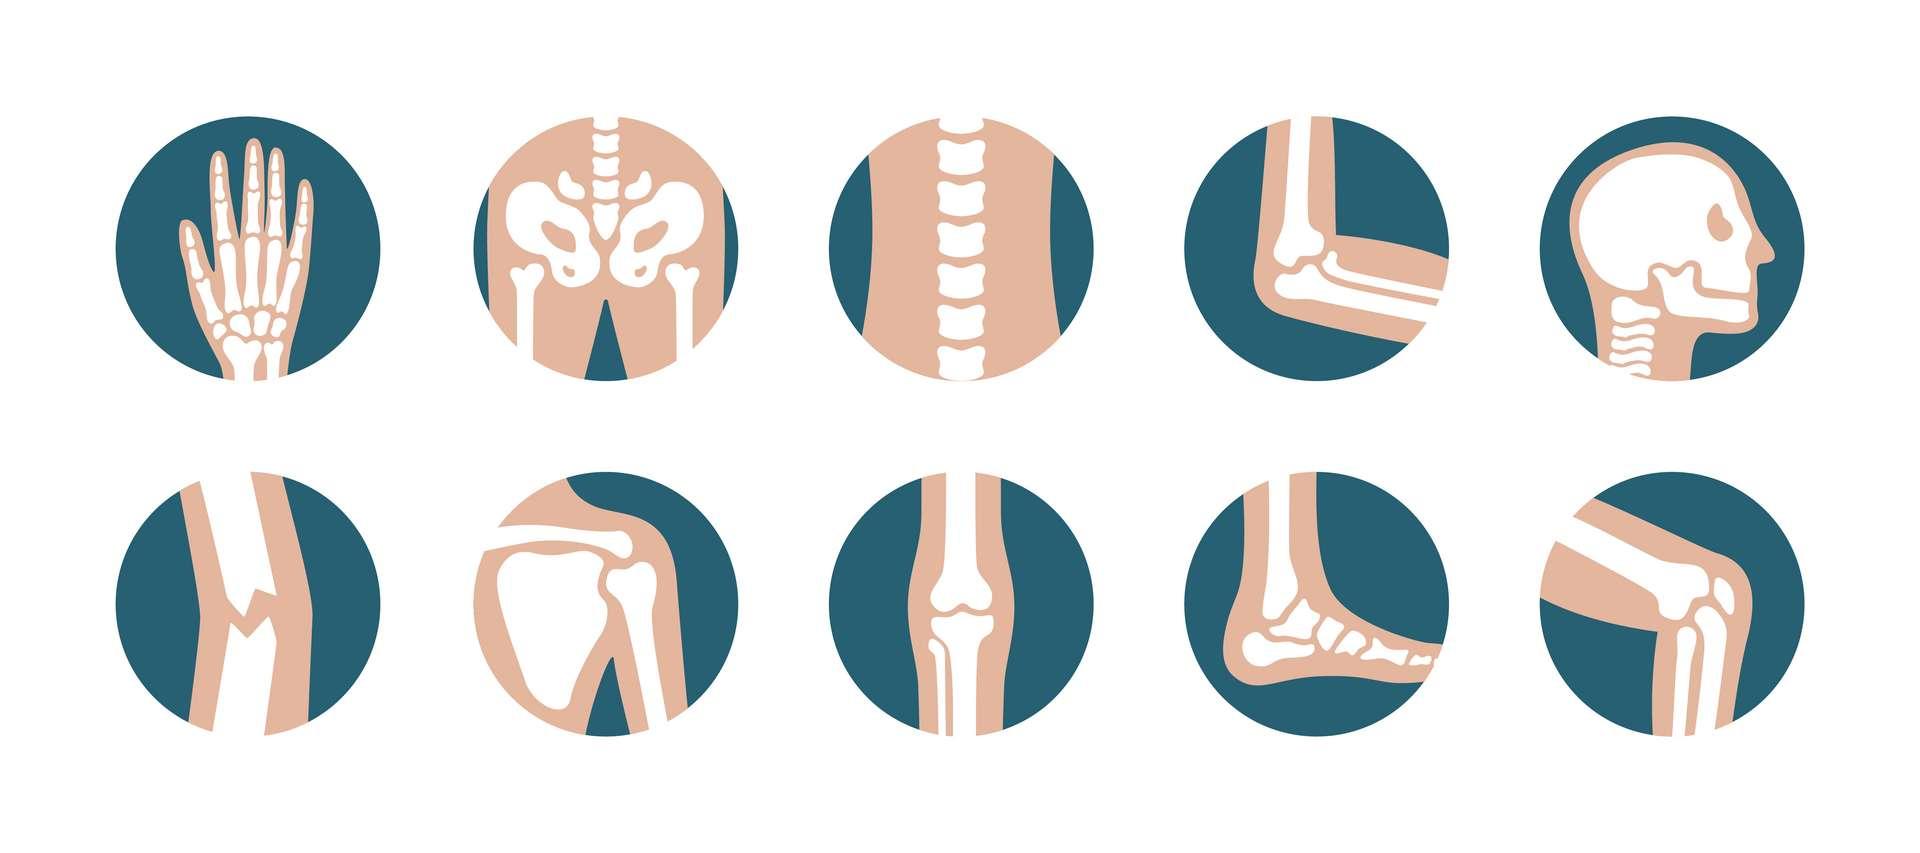 À l'âge adulte, le corps humain comporte 206 os. © Lifeking, Adobe Stock